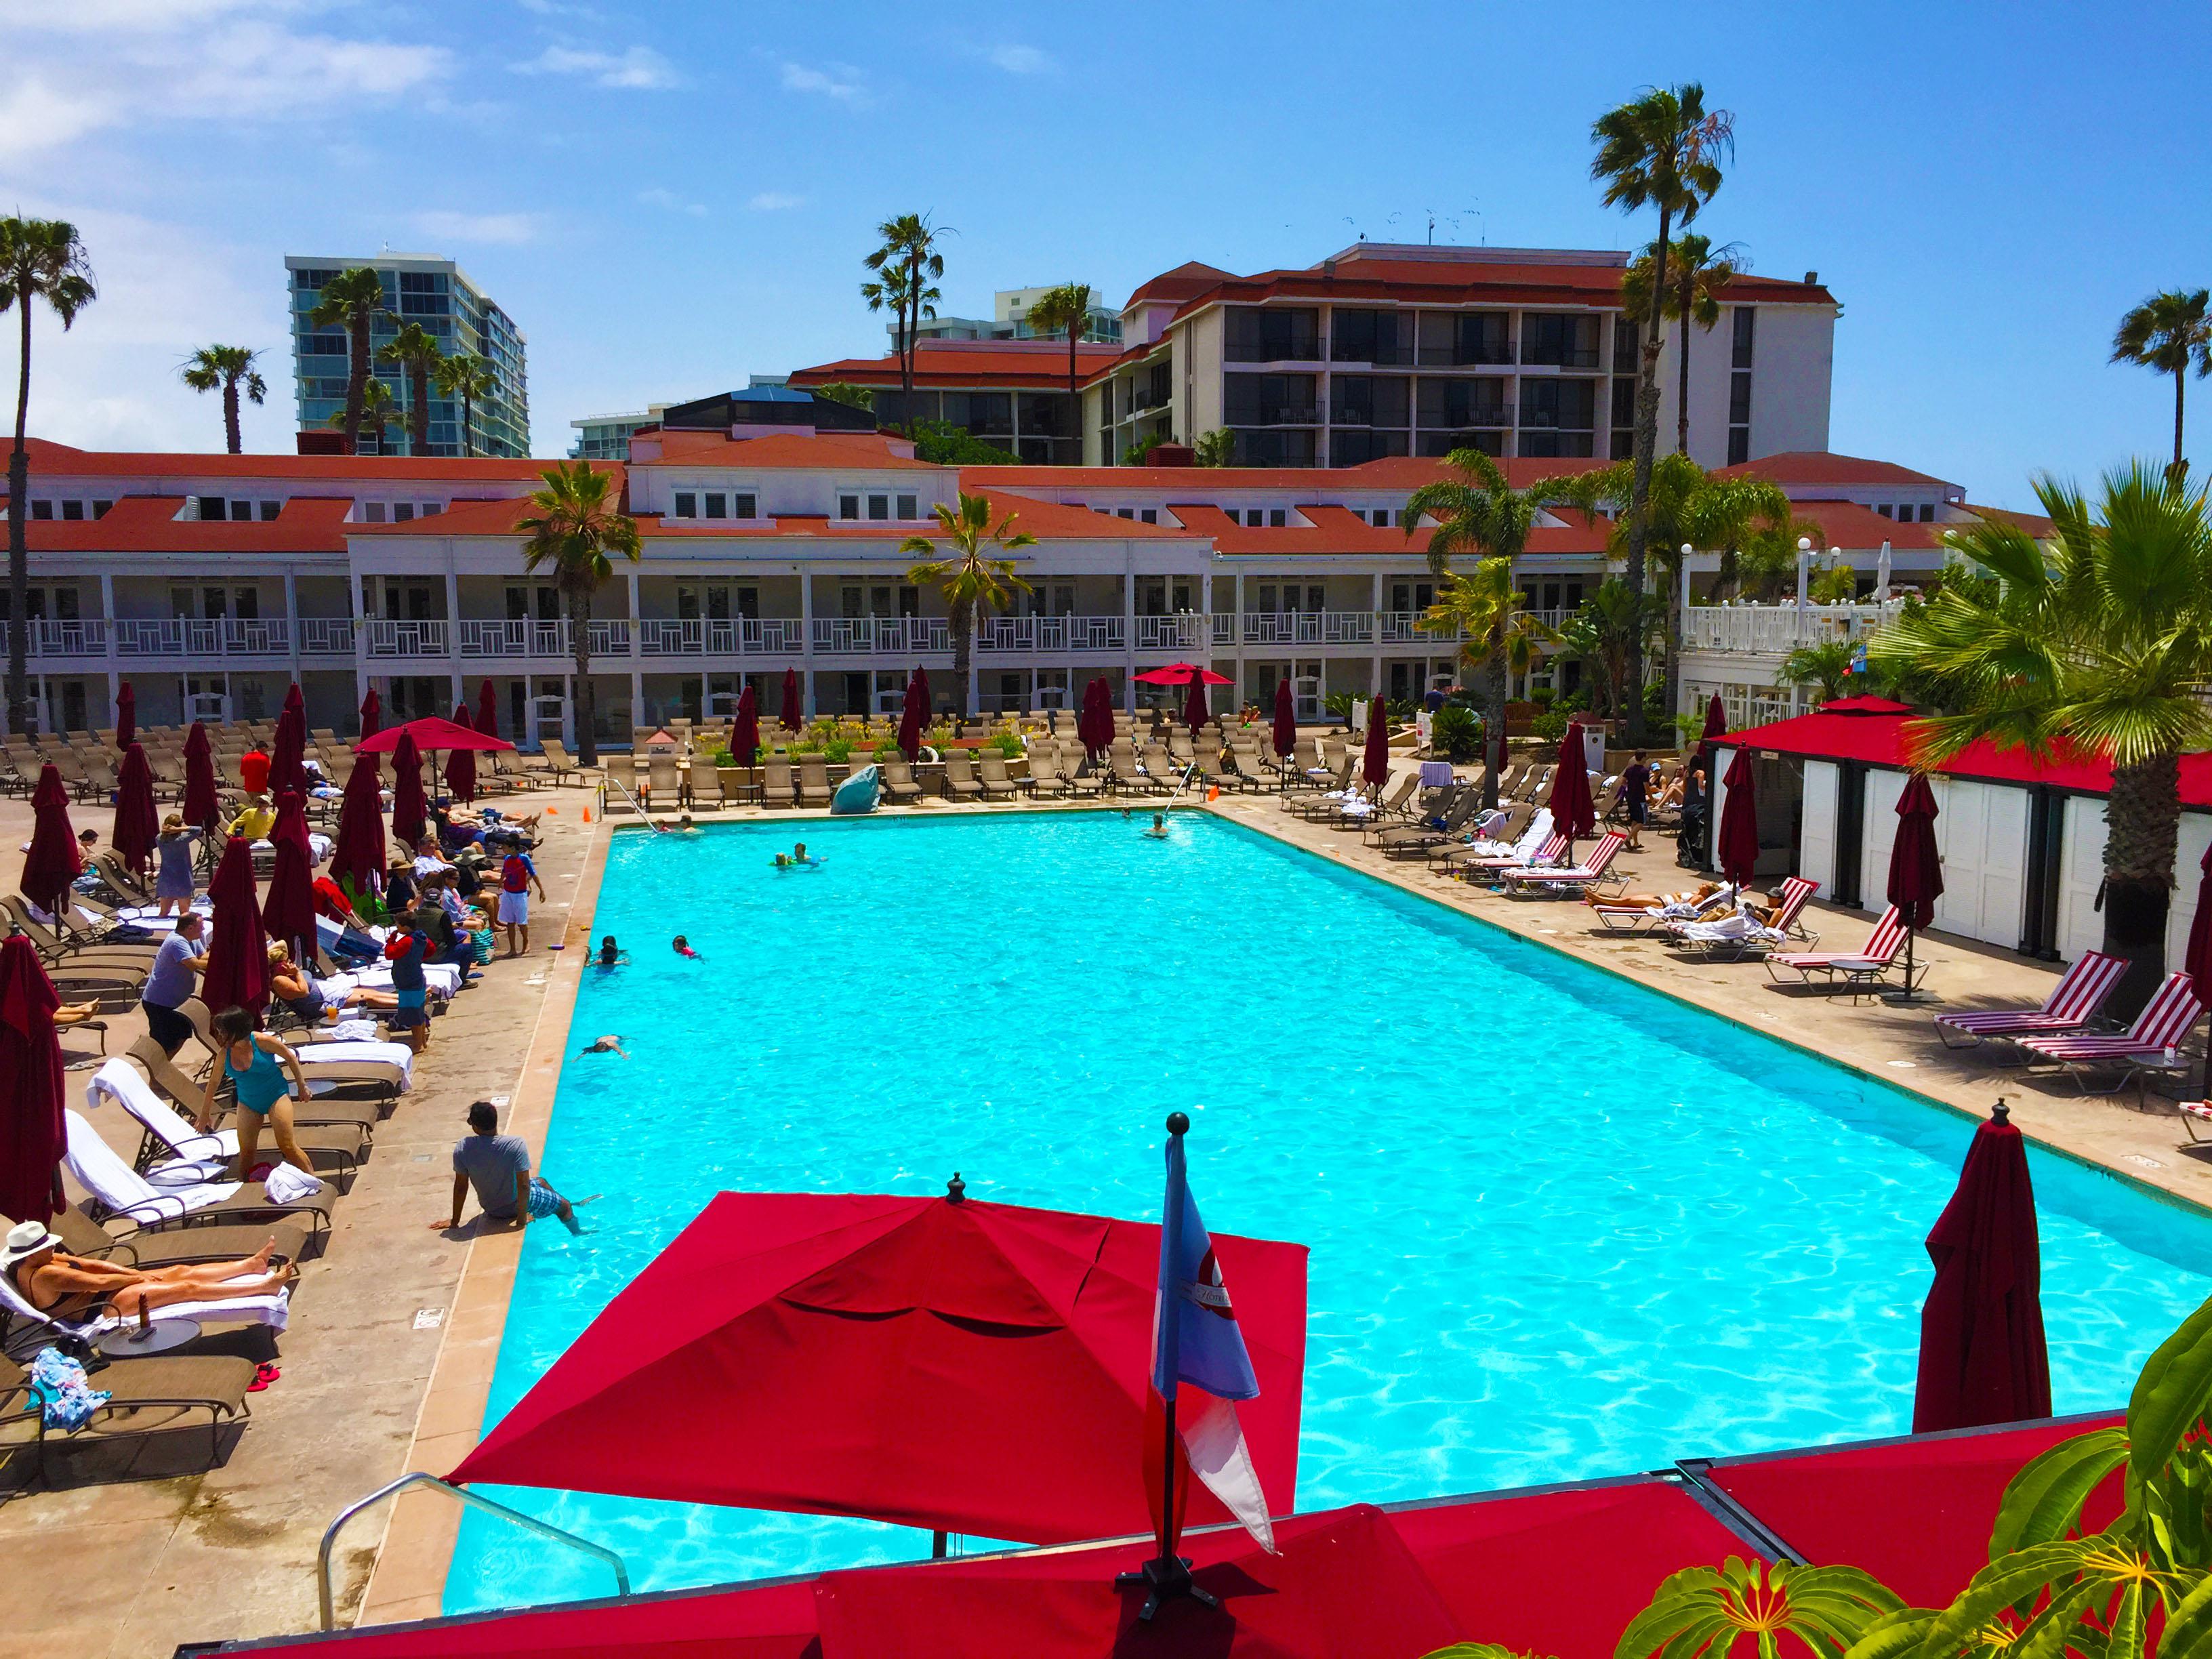 Kyle Langan, Hamptons to Hollywood - Coronado